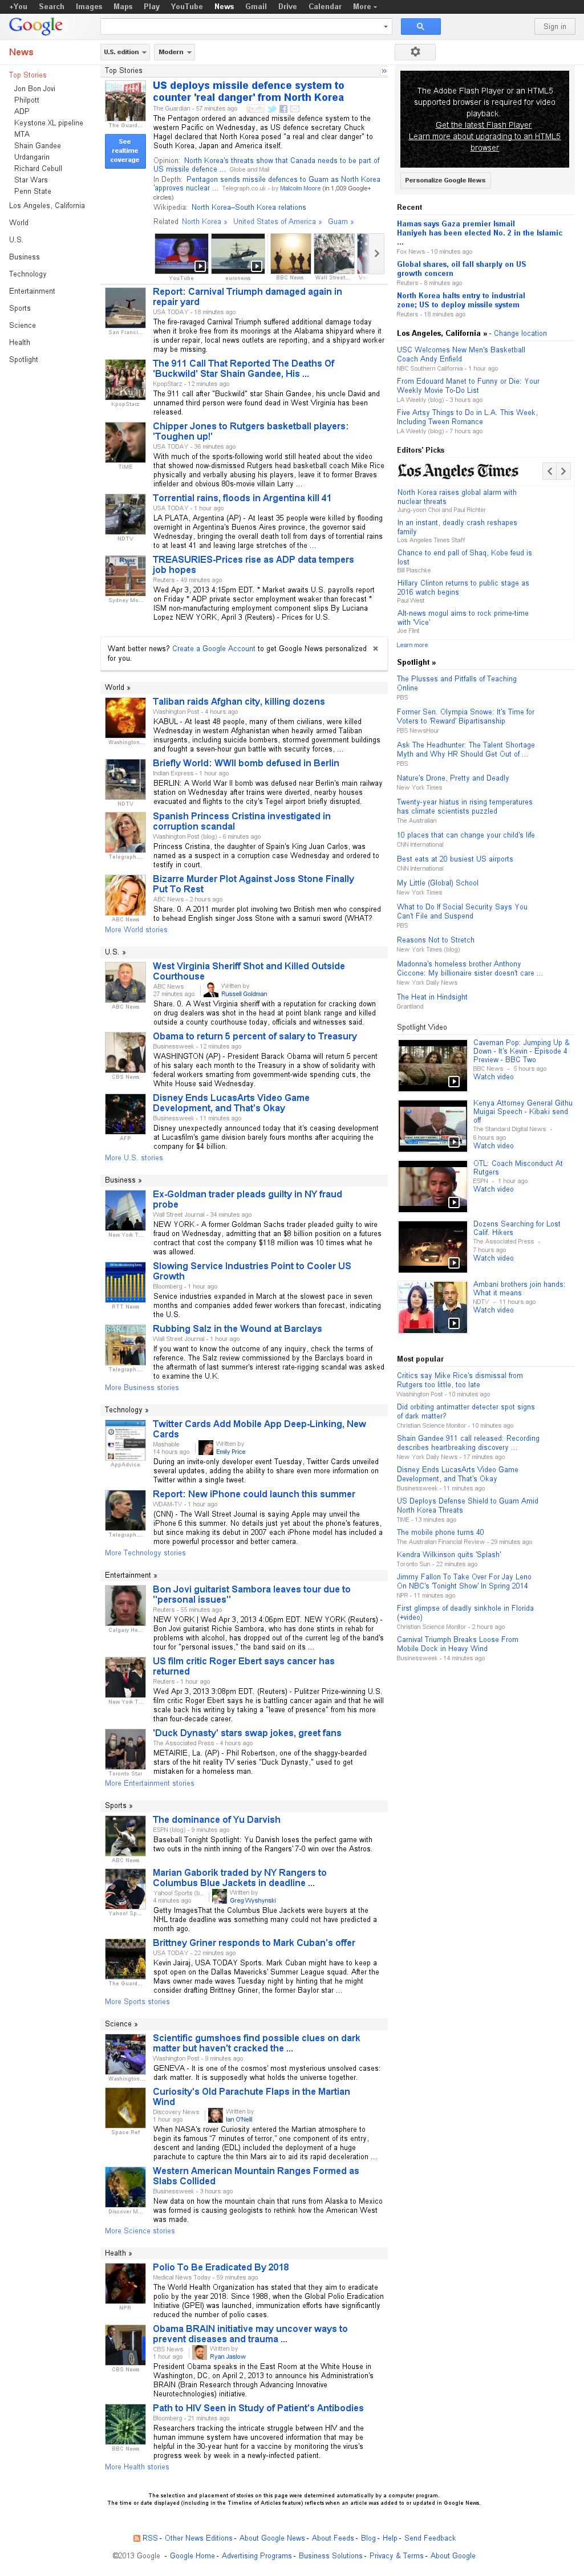 Google News at Wednesday April 3, 2013, 9:06 p.m. UTC